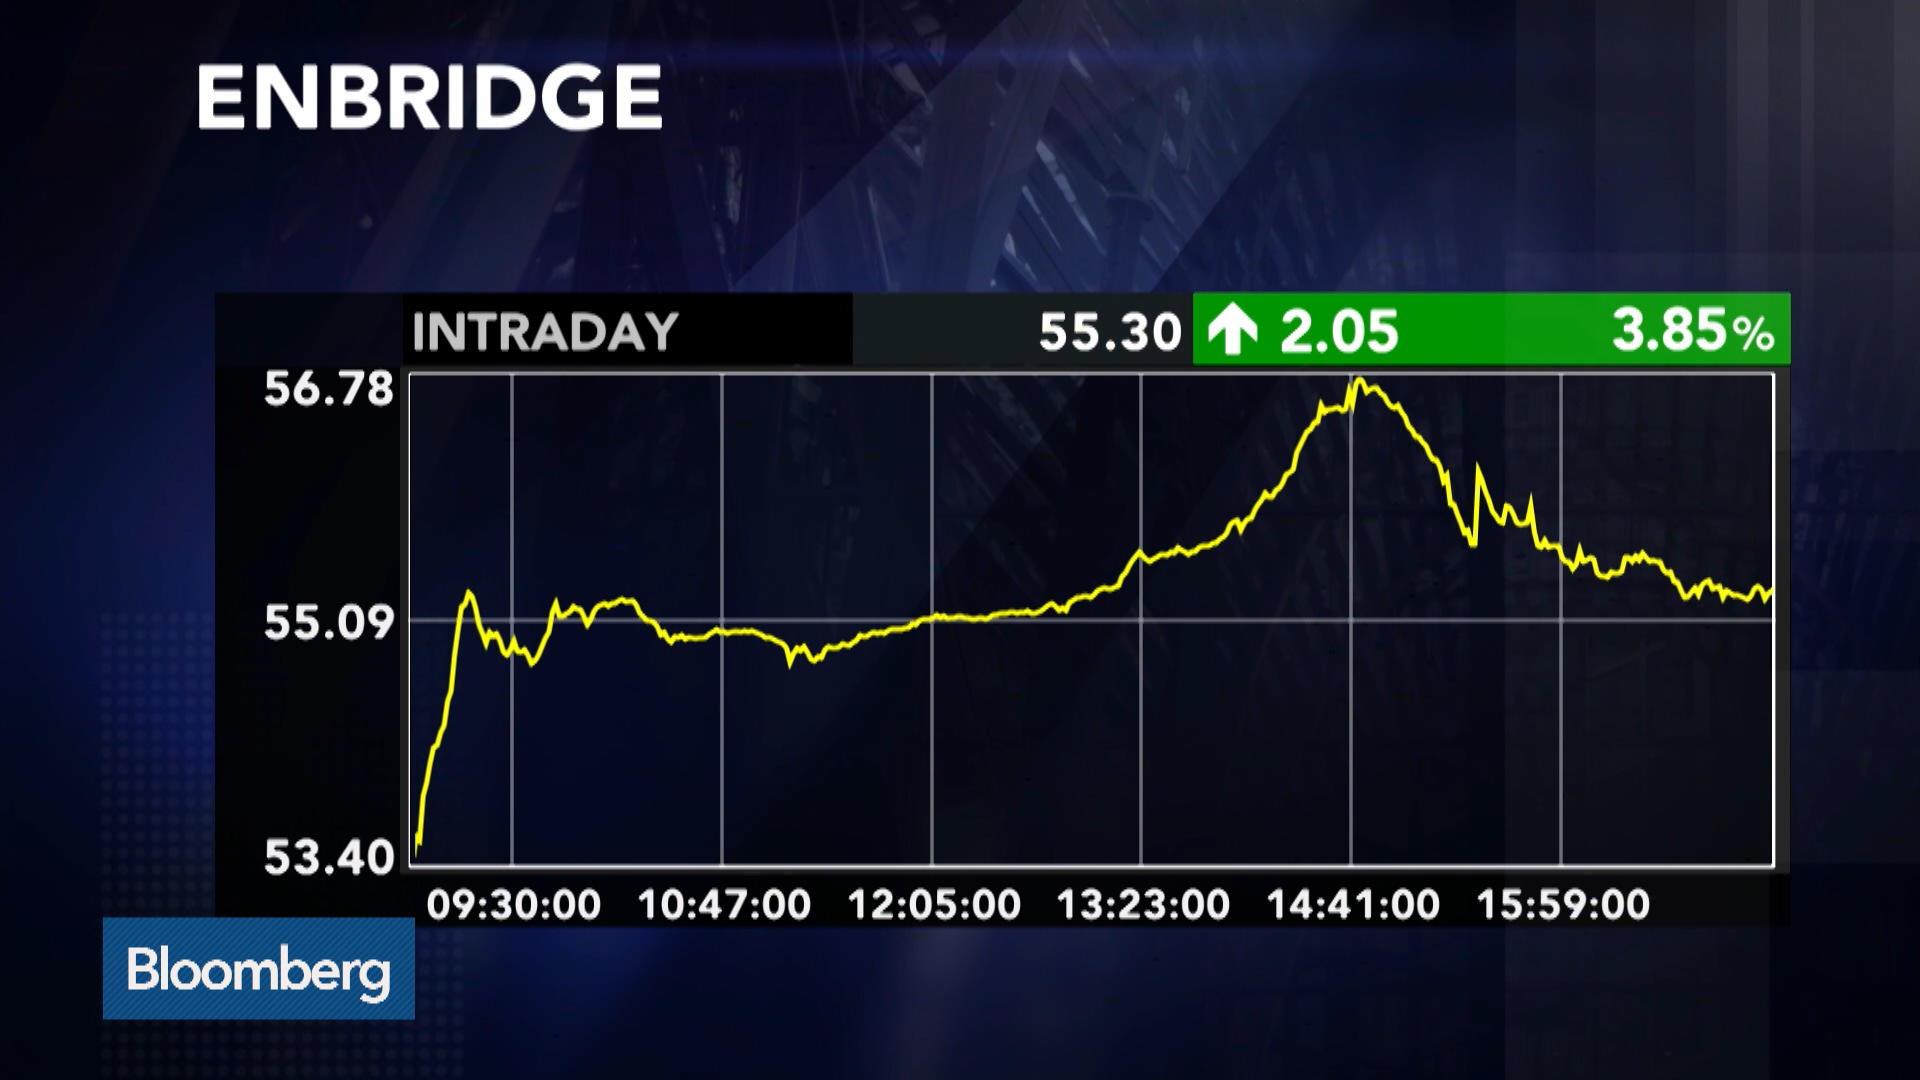 Enb Toronto Stock Quote Enbridge Inc Bloomberg Markets